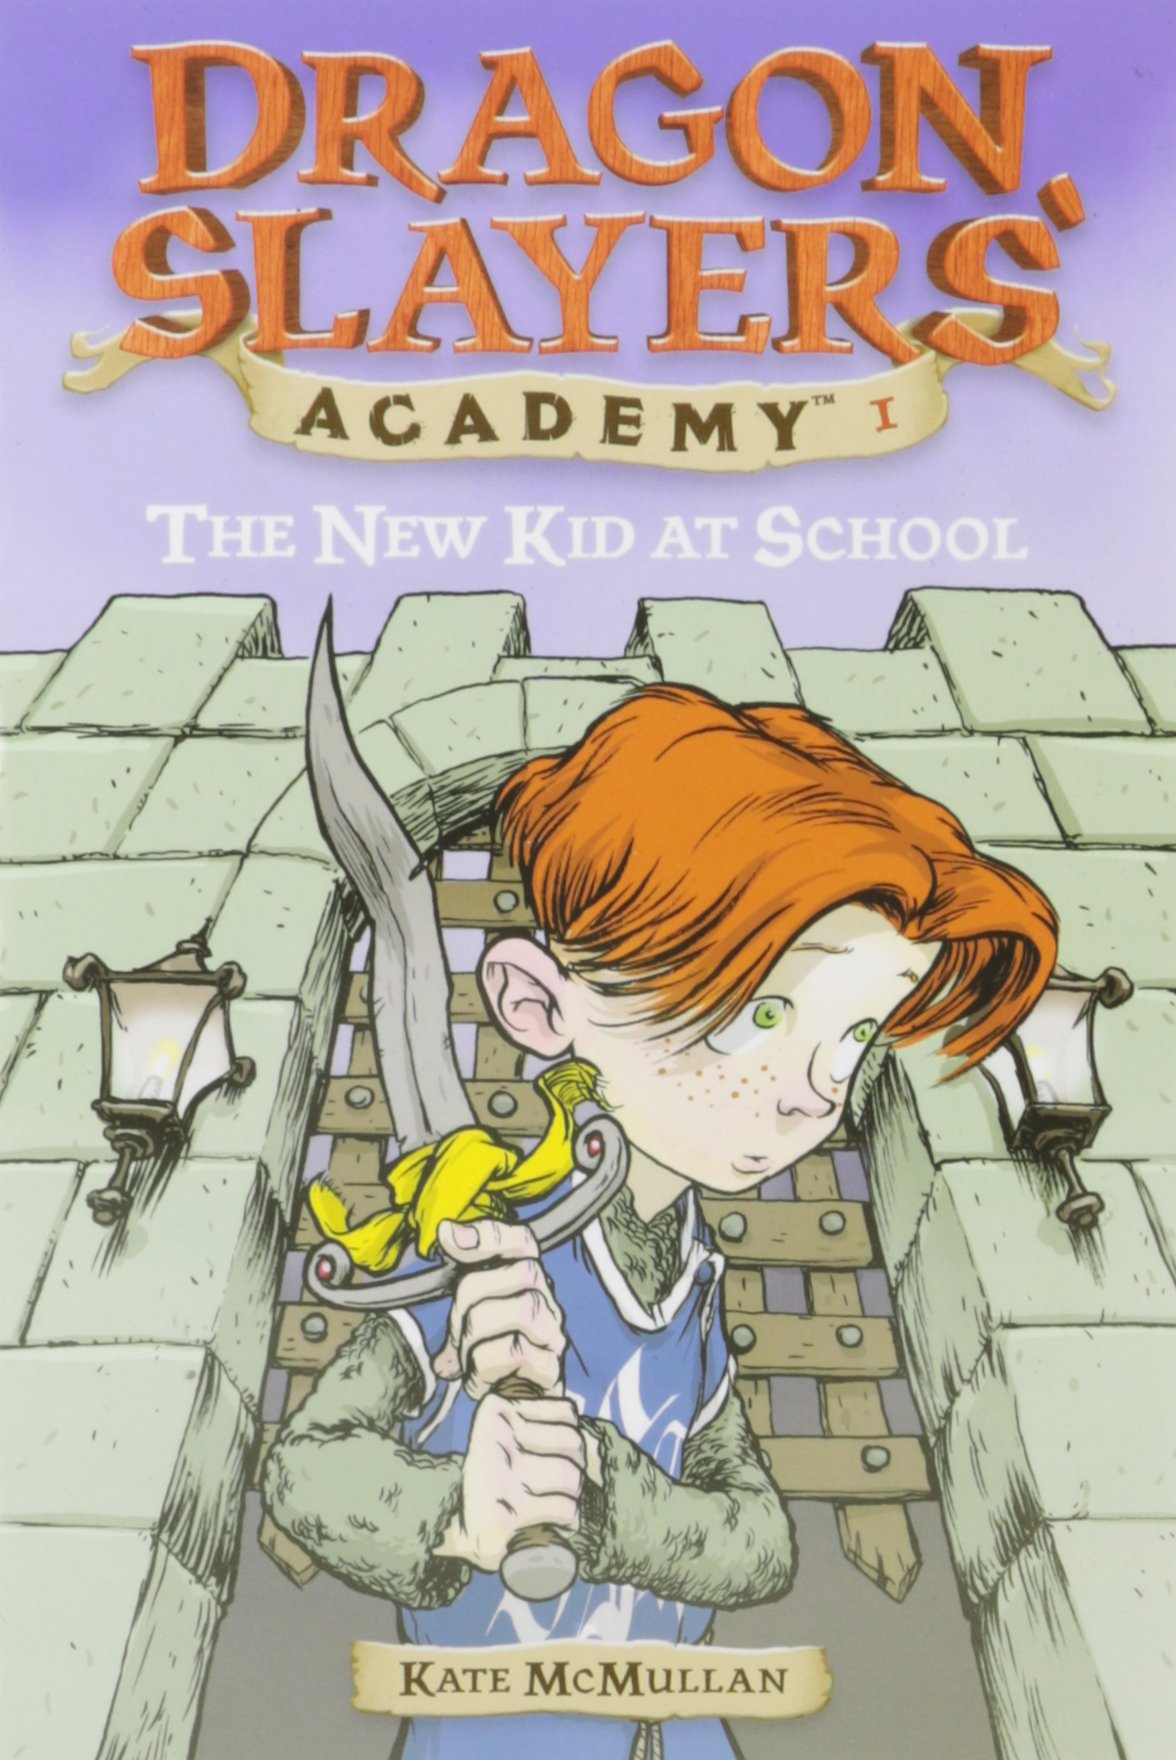 New School Dragon Slayers Academy product image